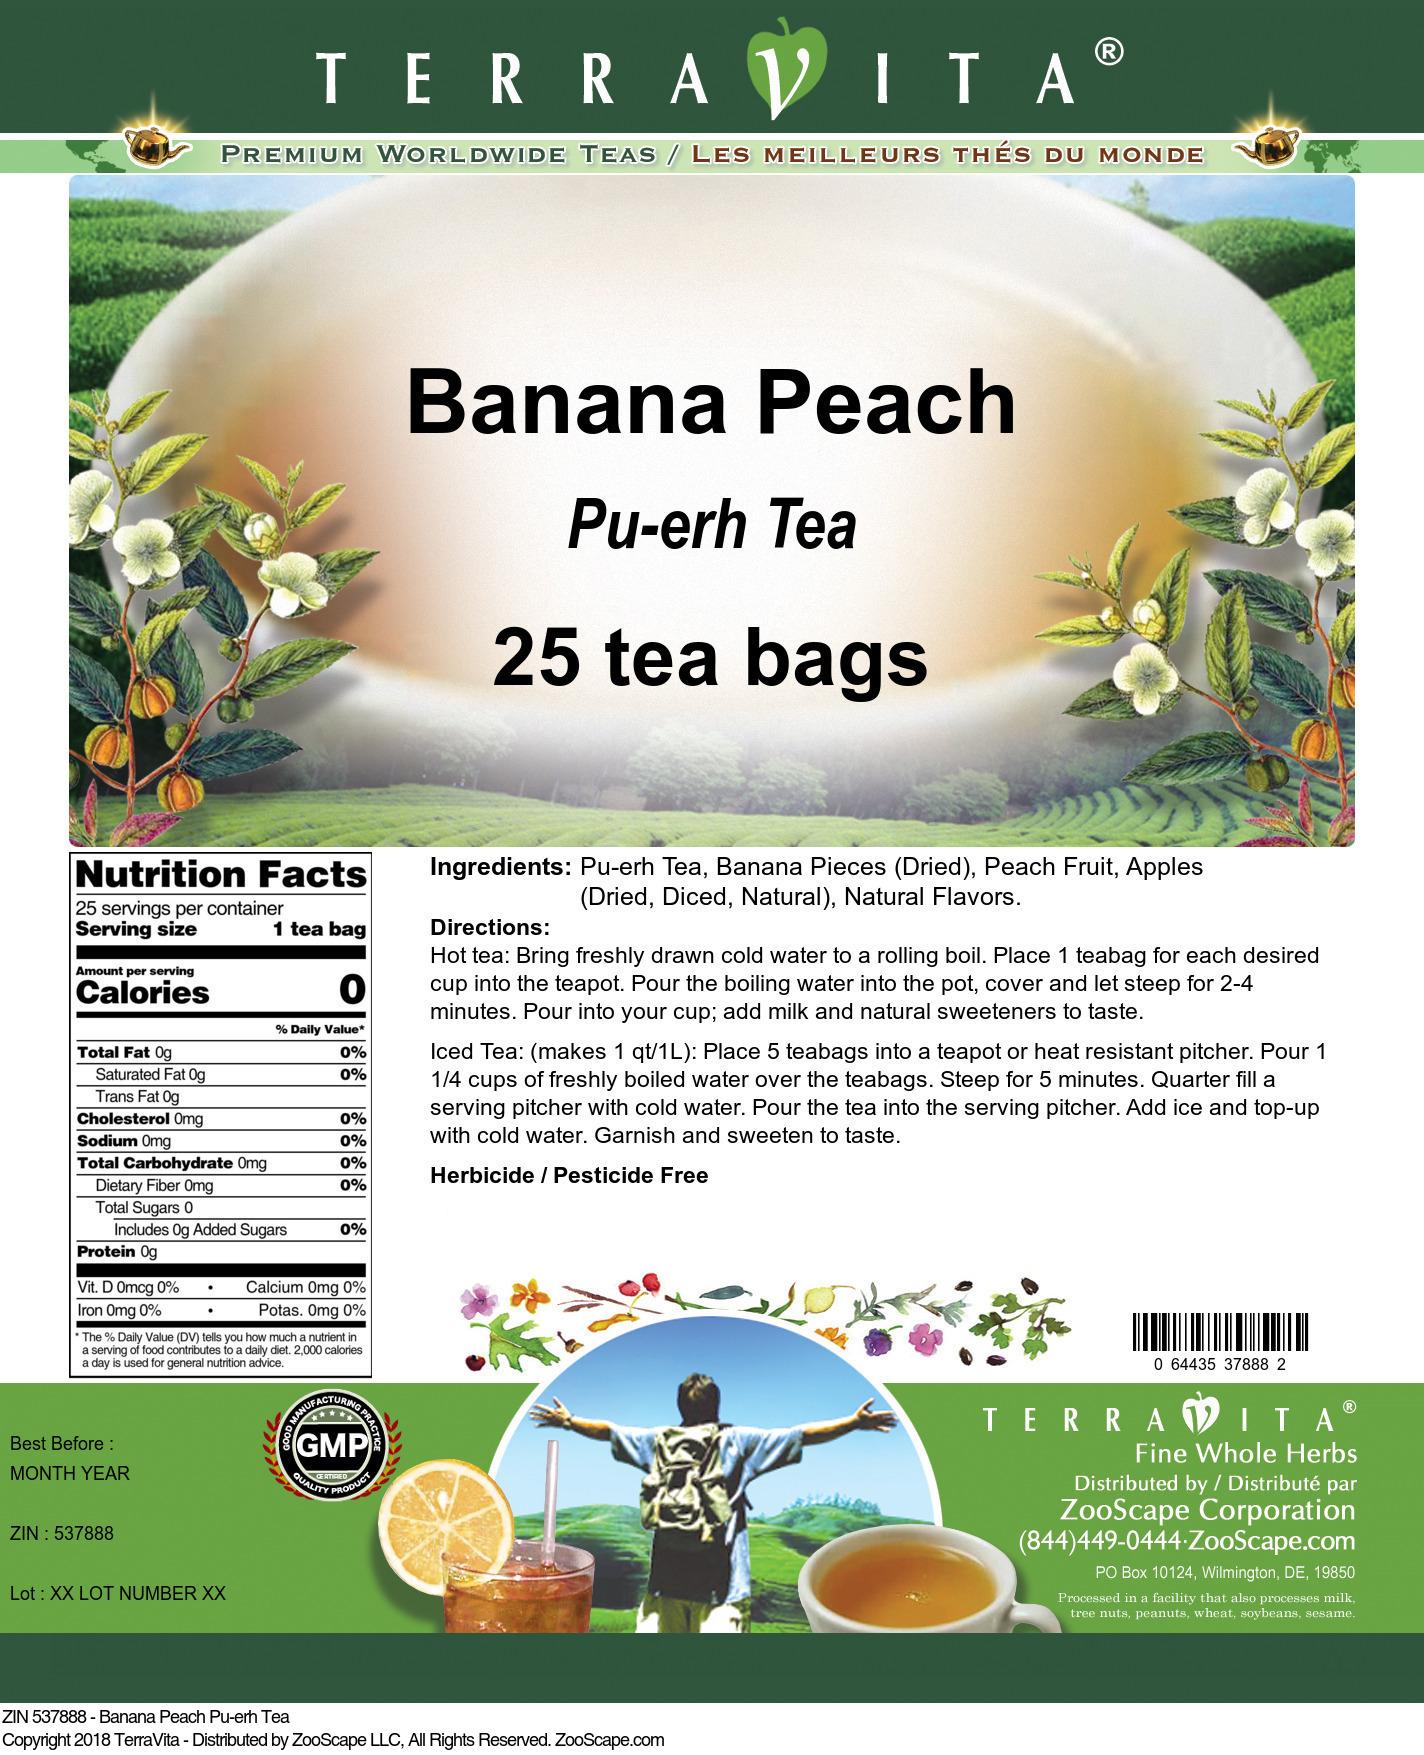 Banana Peach Pu-erh Tea